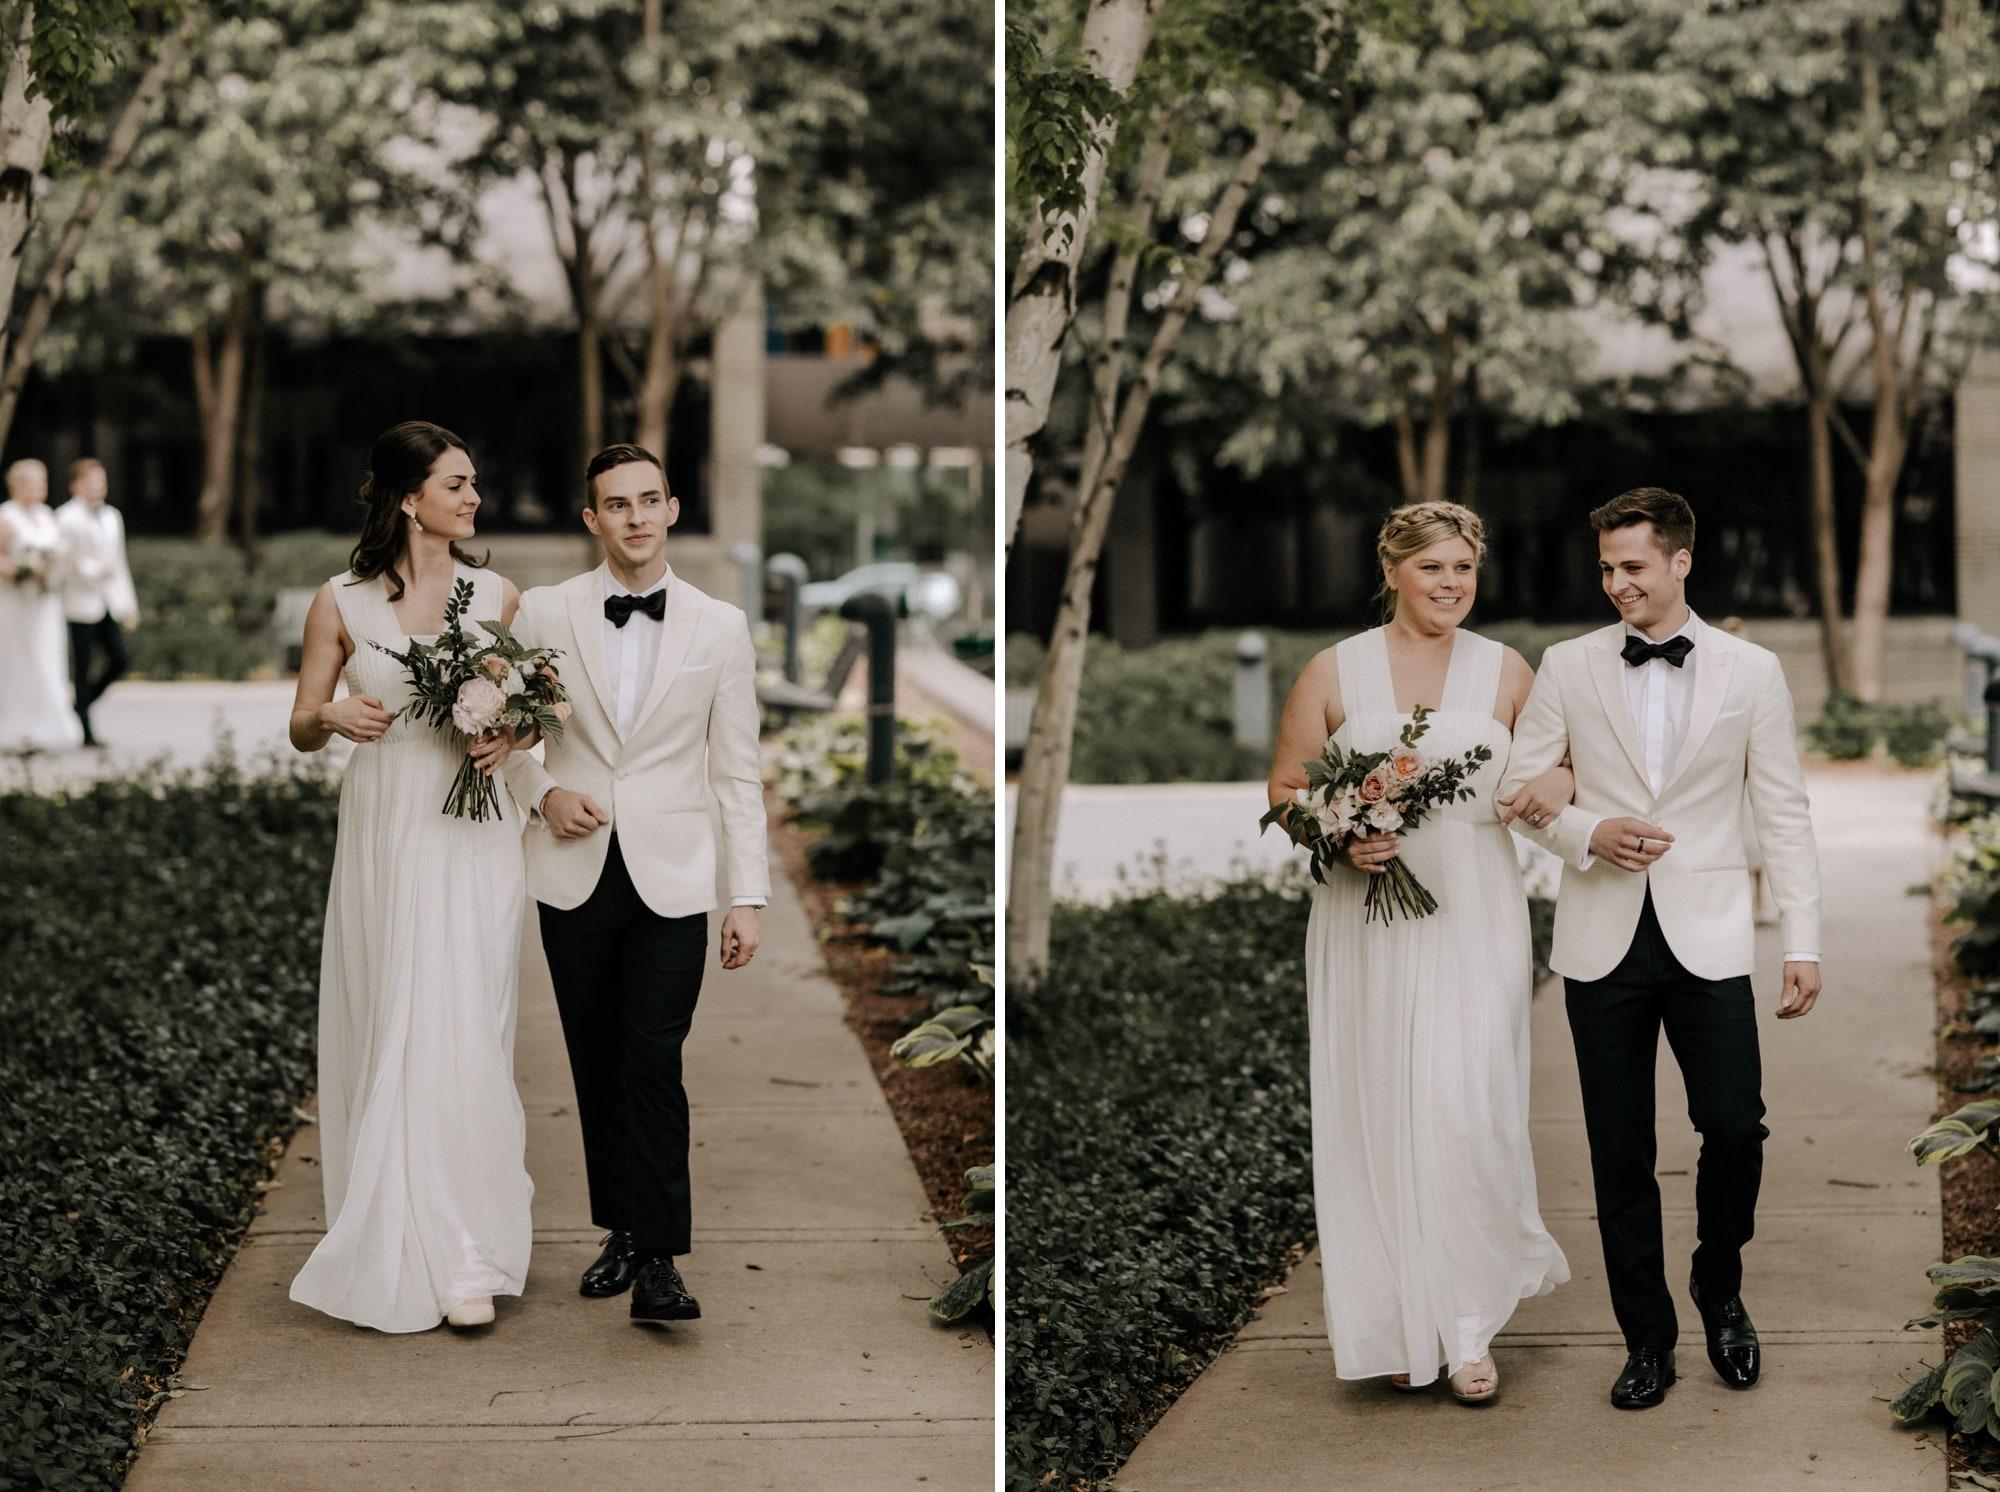 MIA-Minneapolis-Institute-Art-Summer-Wedding-_27.jpg